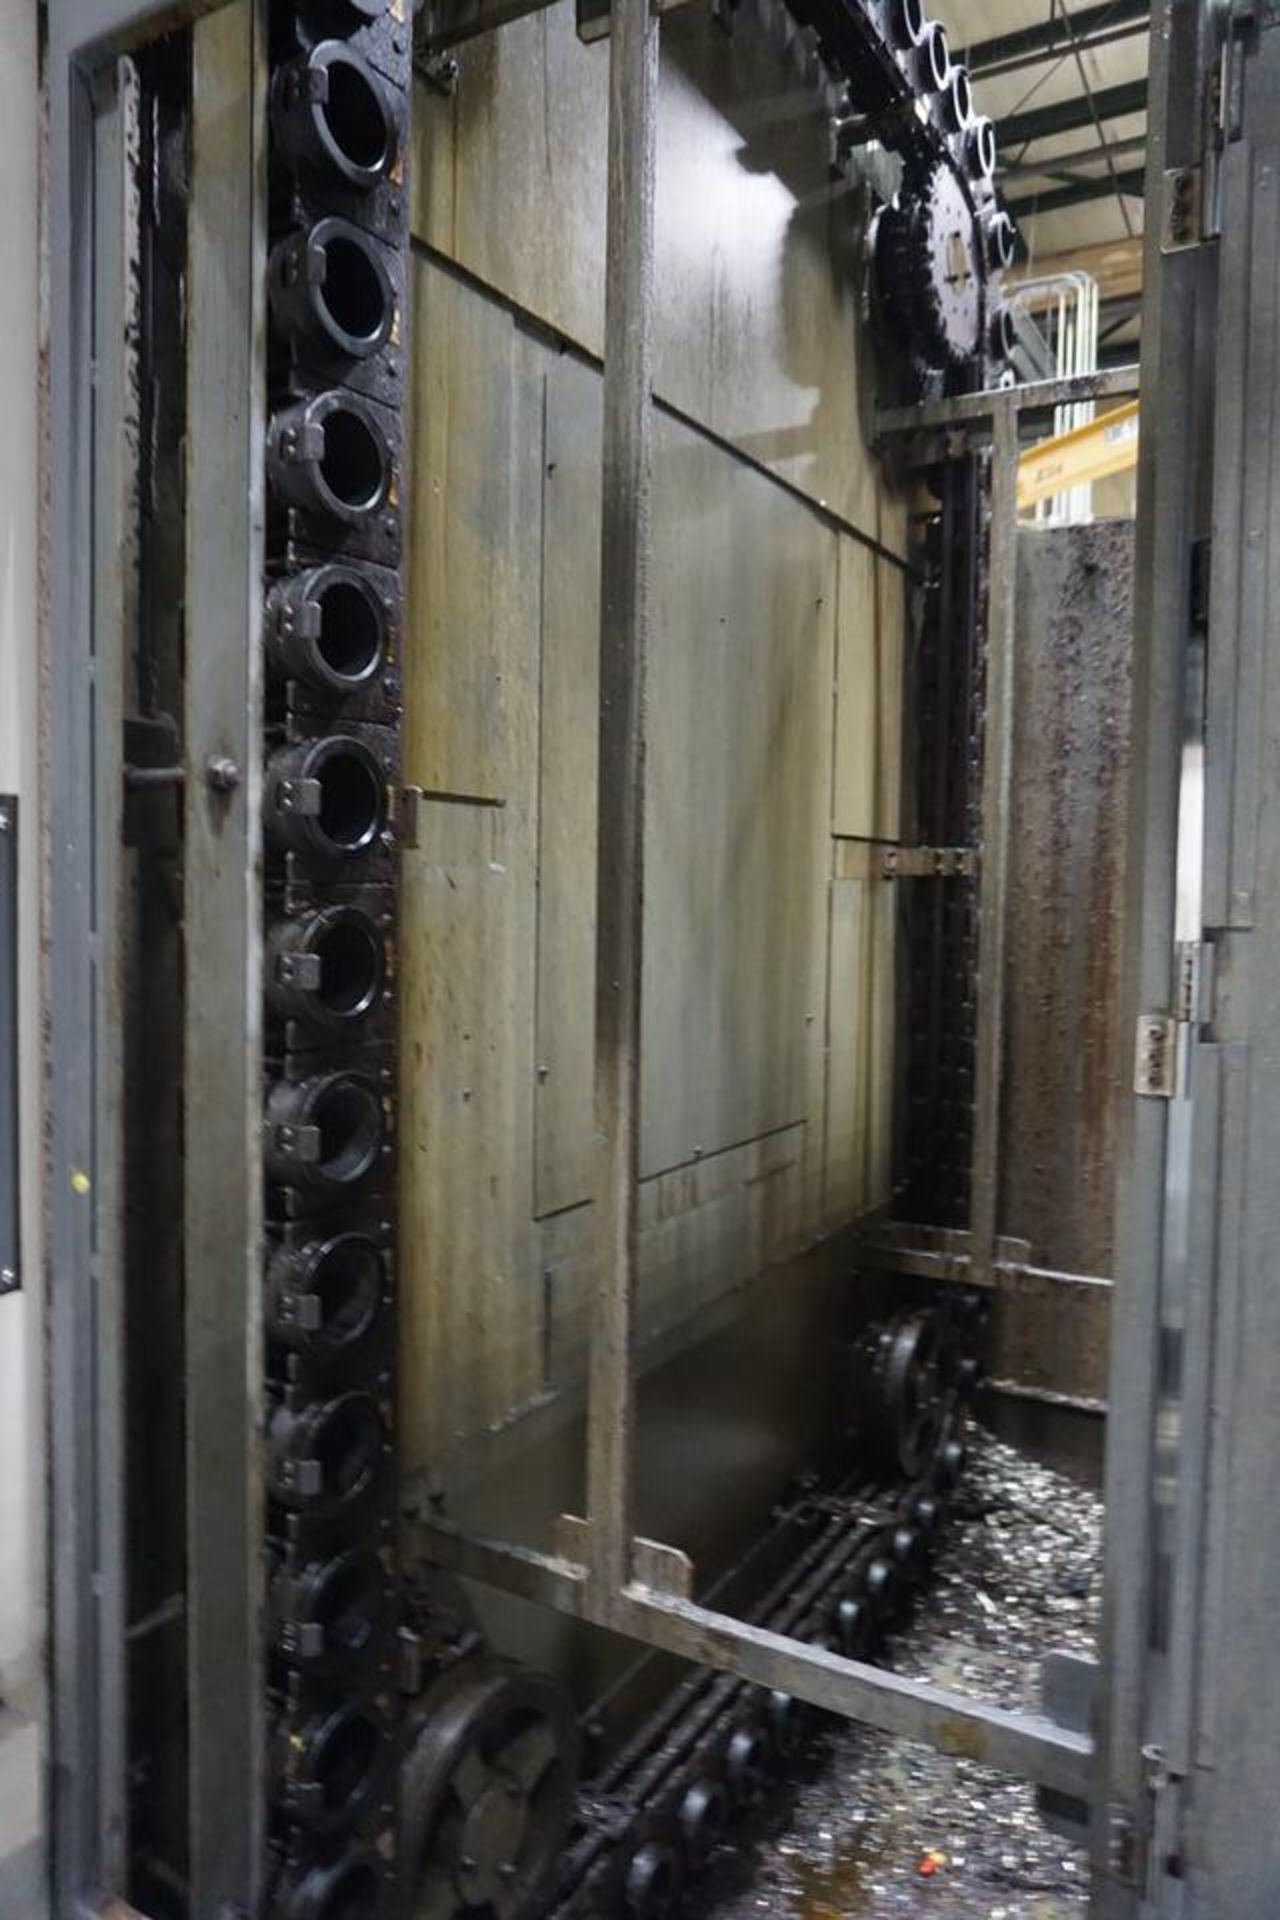 TOYODA HORIZONTAL MILLING MACHINE, DOM:1998 (ASST#: P772100) - Image 5 of 9